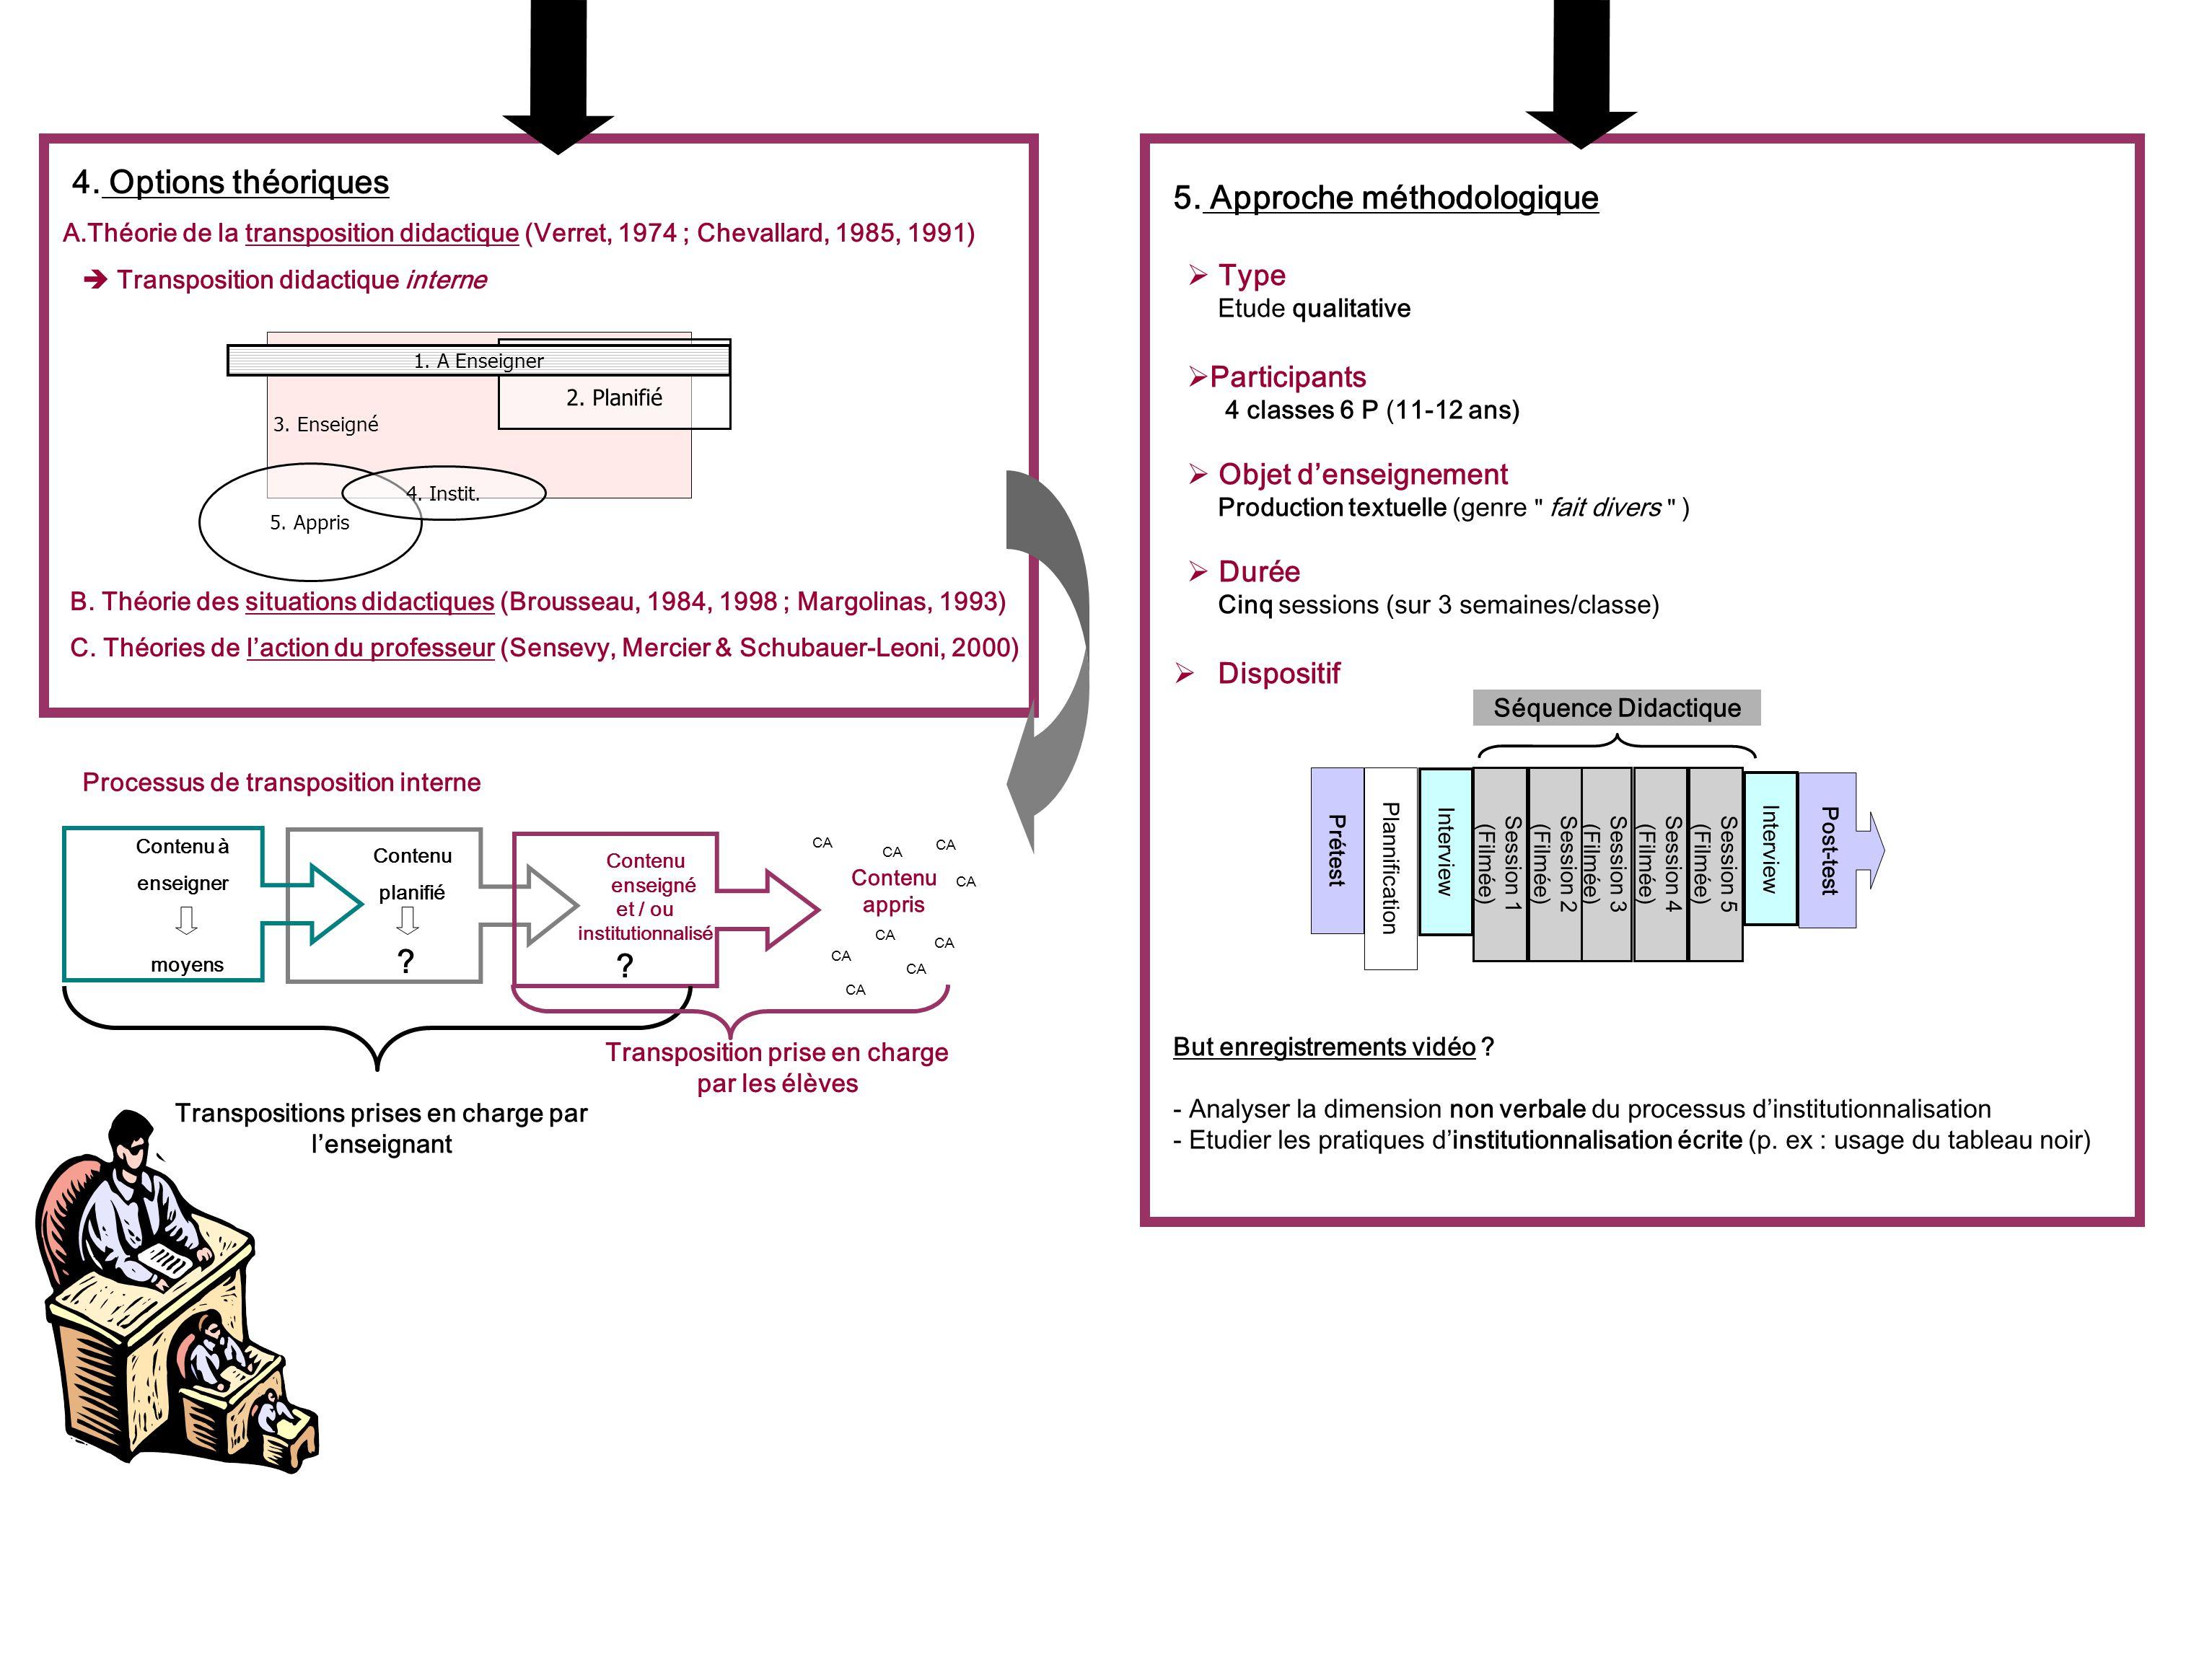 Processus de transposition interne